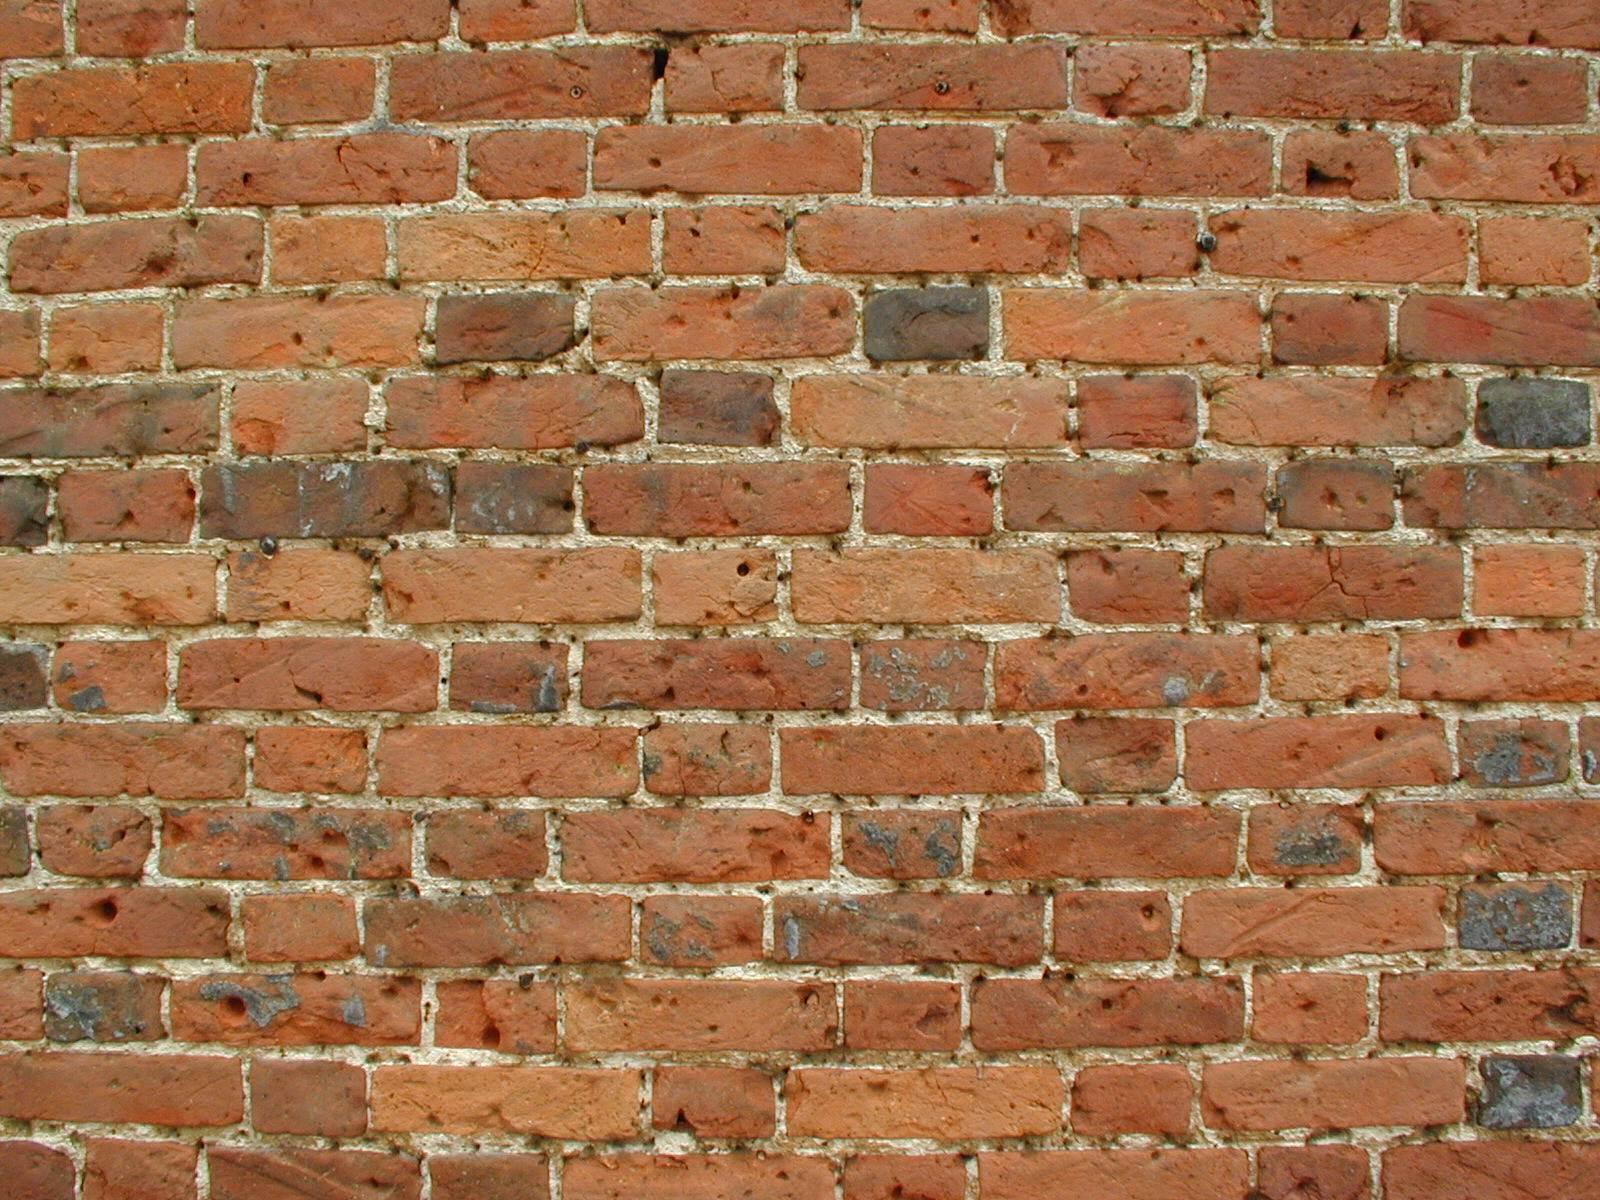 brick box image brick wall tile. Black Bedroom Furniture Sets. Home Design Ideas